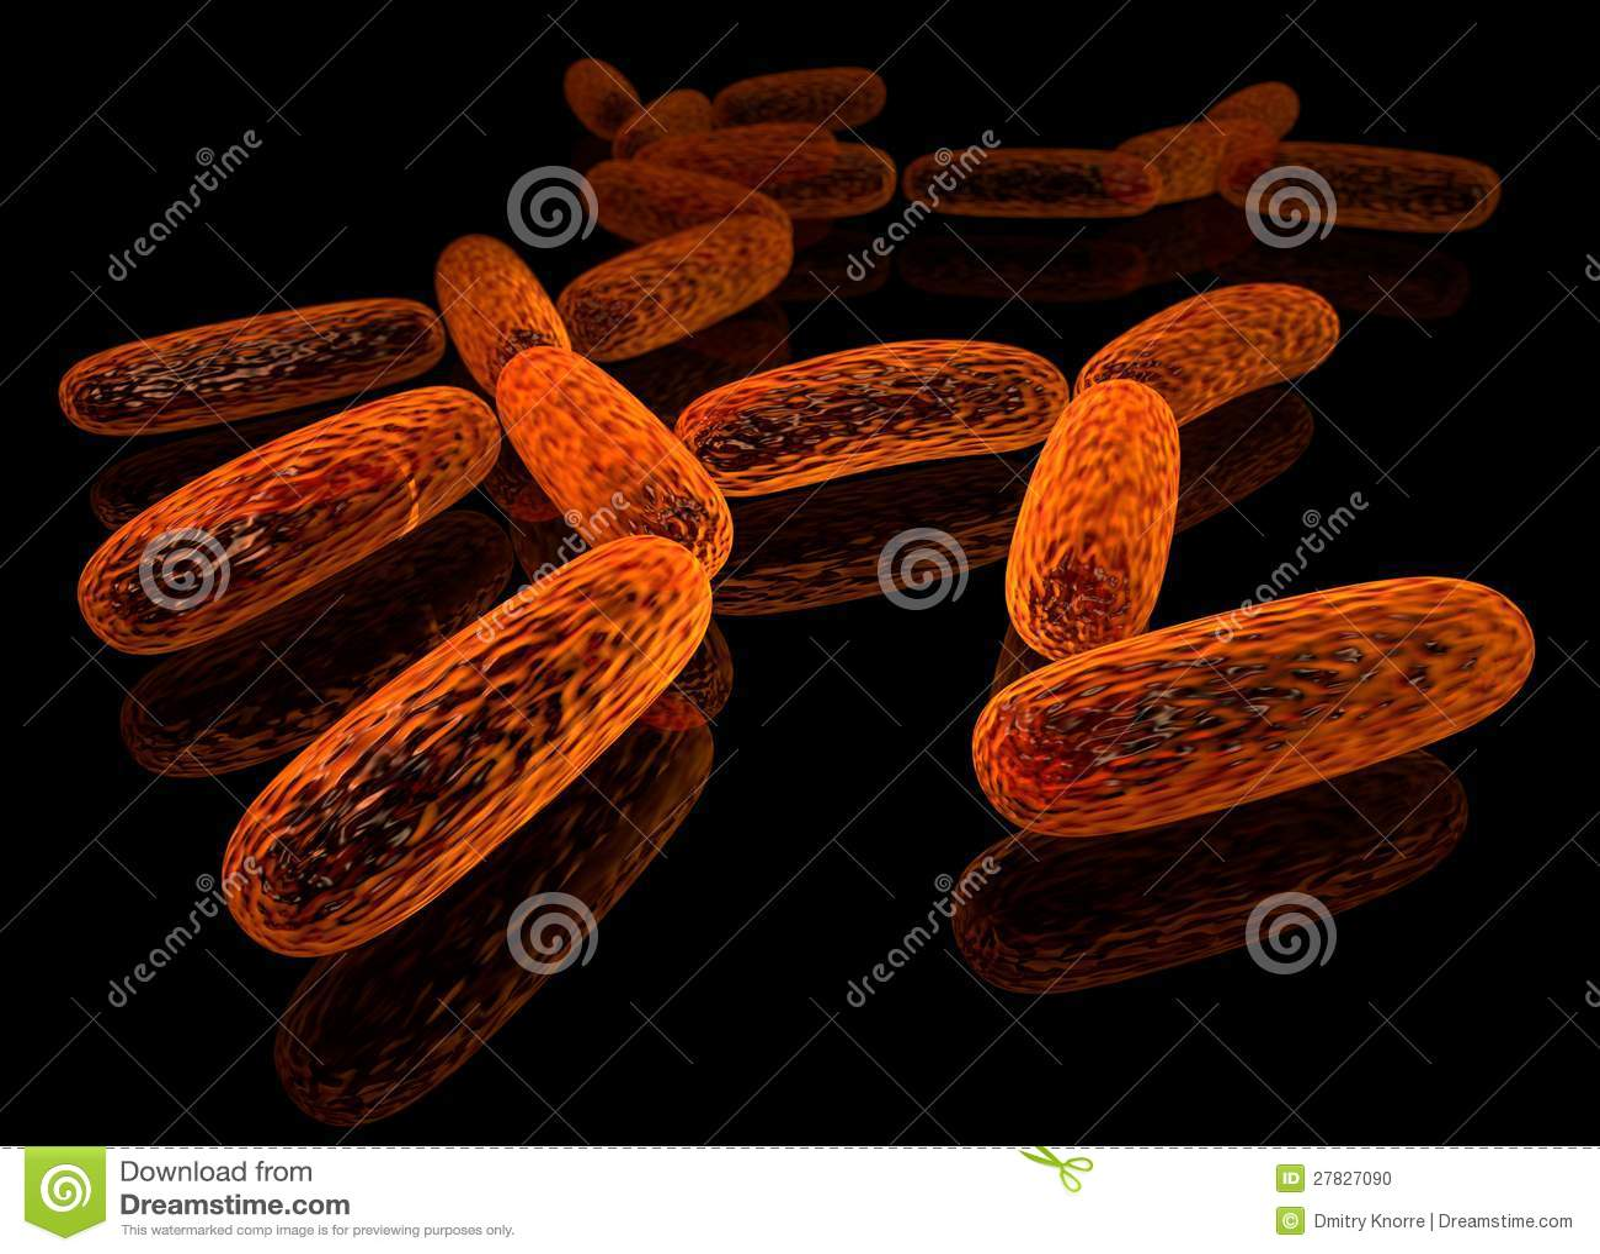 bacillus stock illustration illustration of illness 27827090